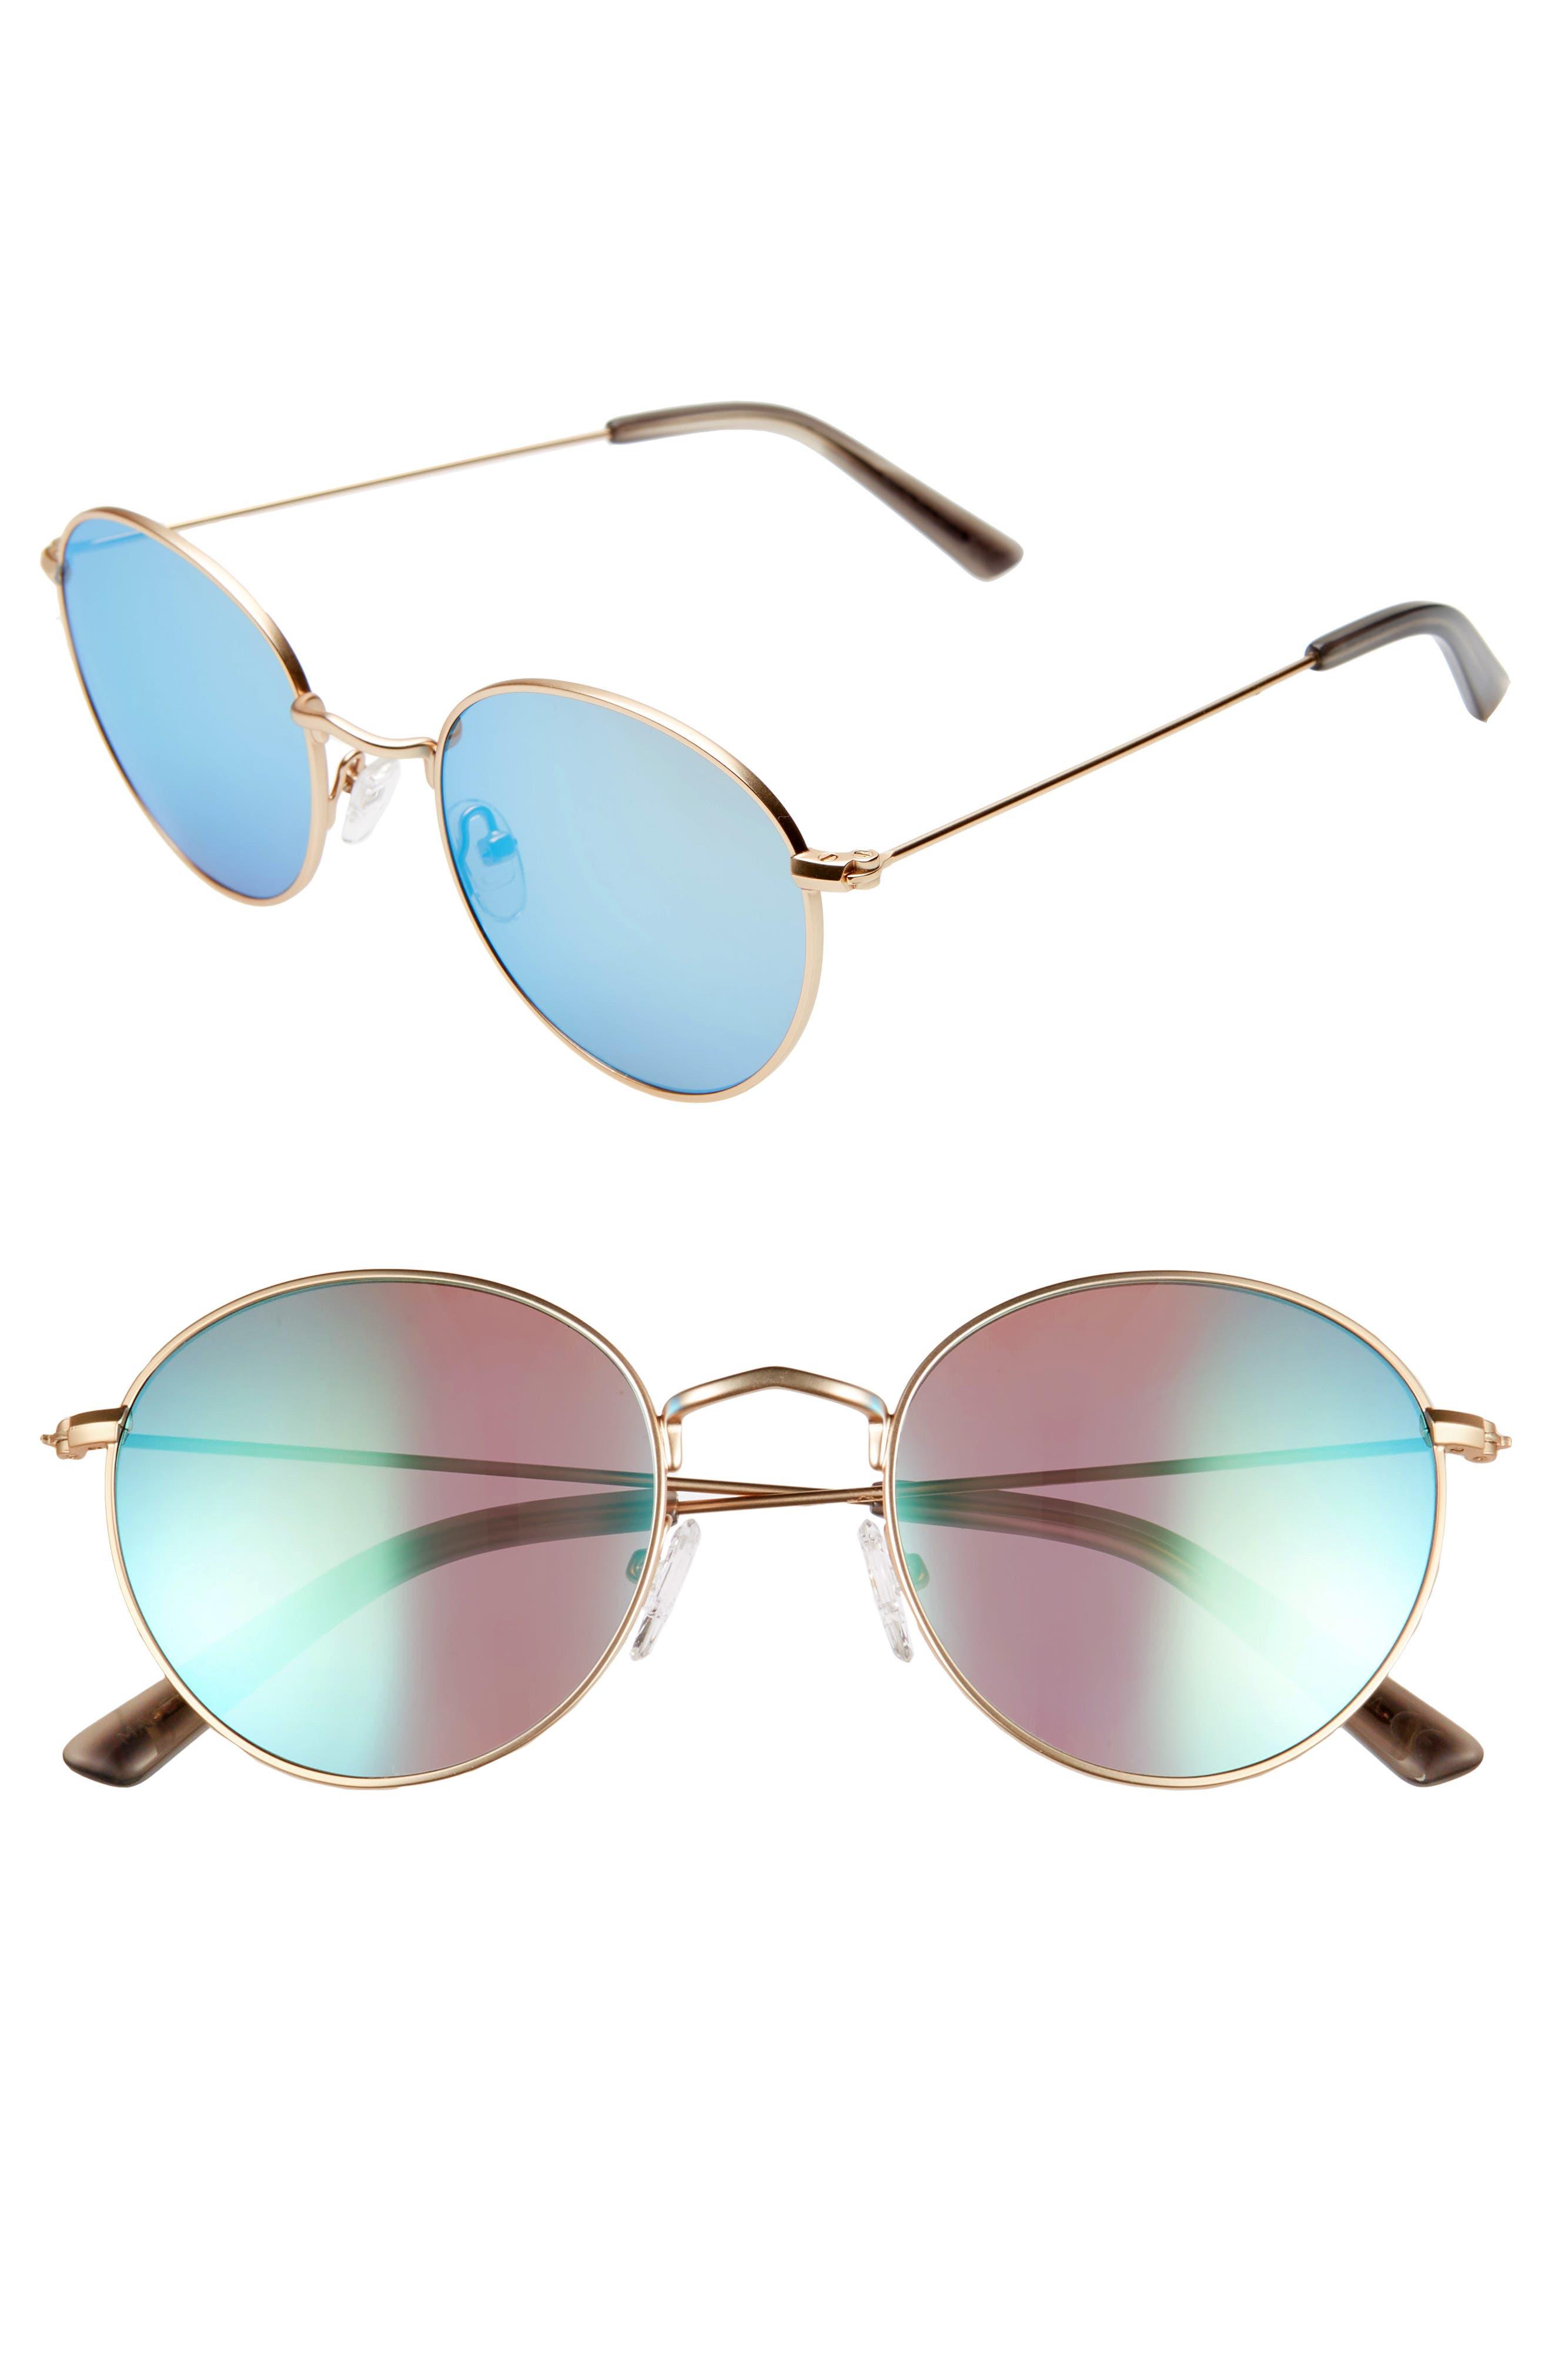 Madewell Fest 50Mm Aviator Sunglasses - Gold/ Blue